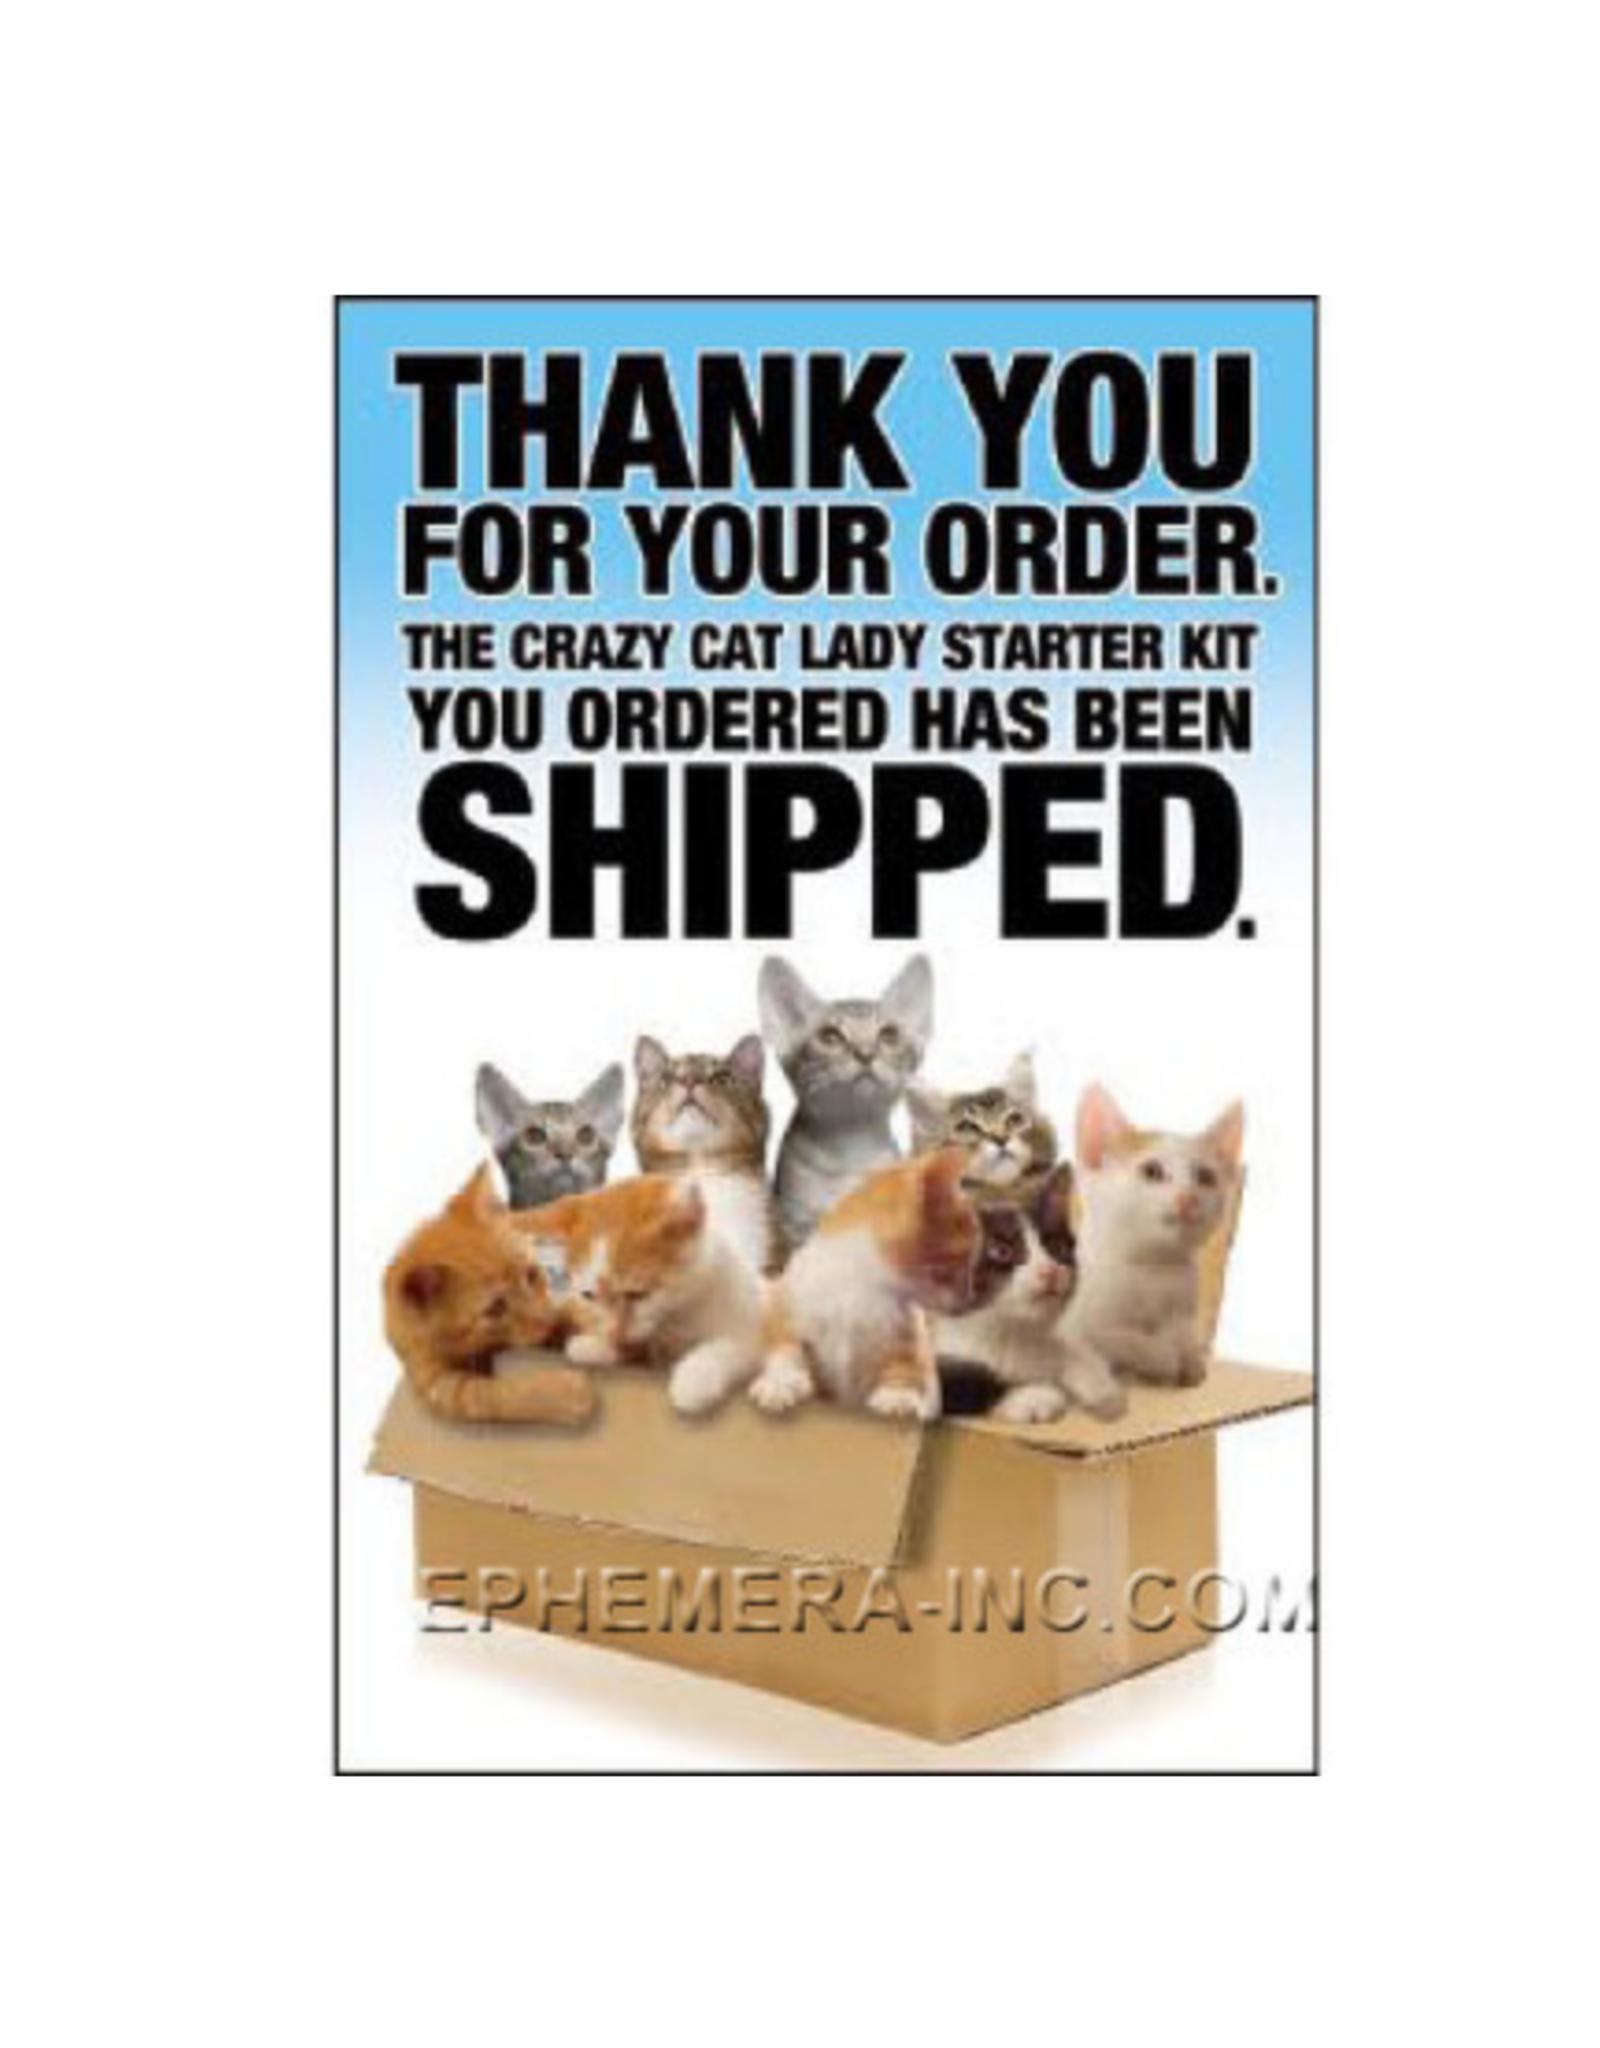 Crazy Cat Lady Starter Kit has Shipped Magnet